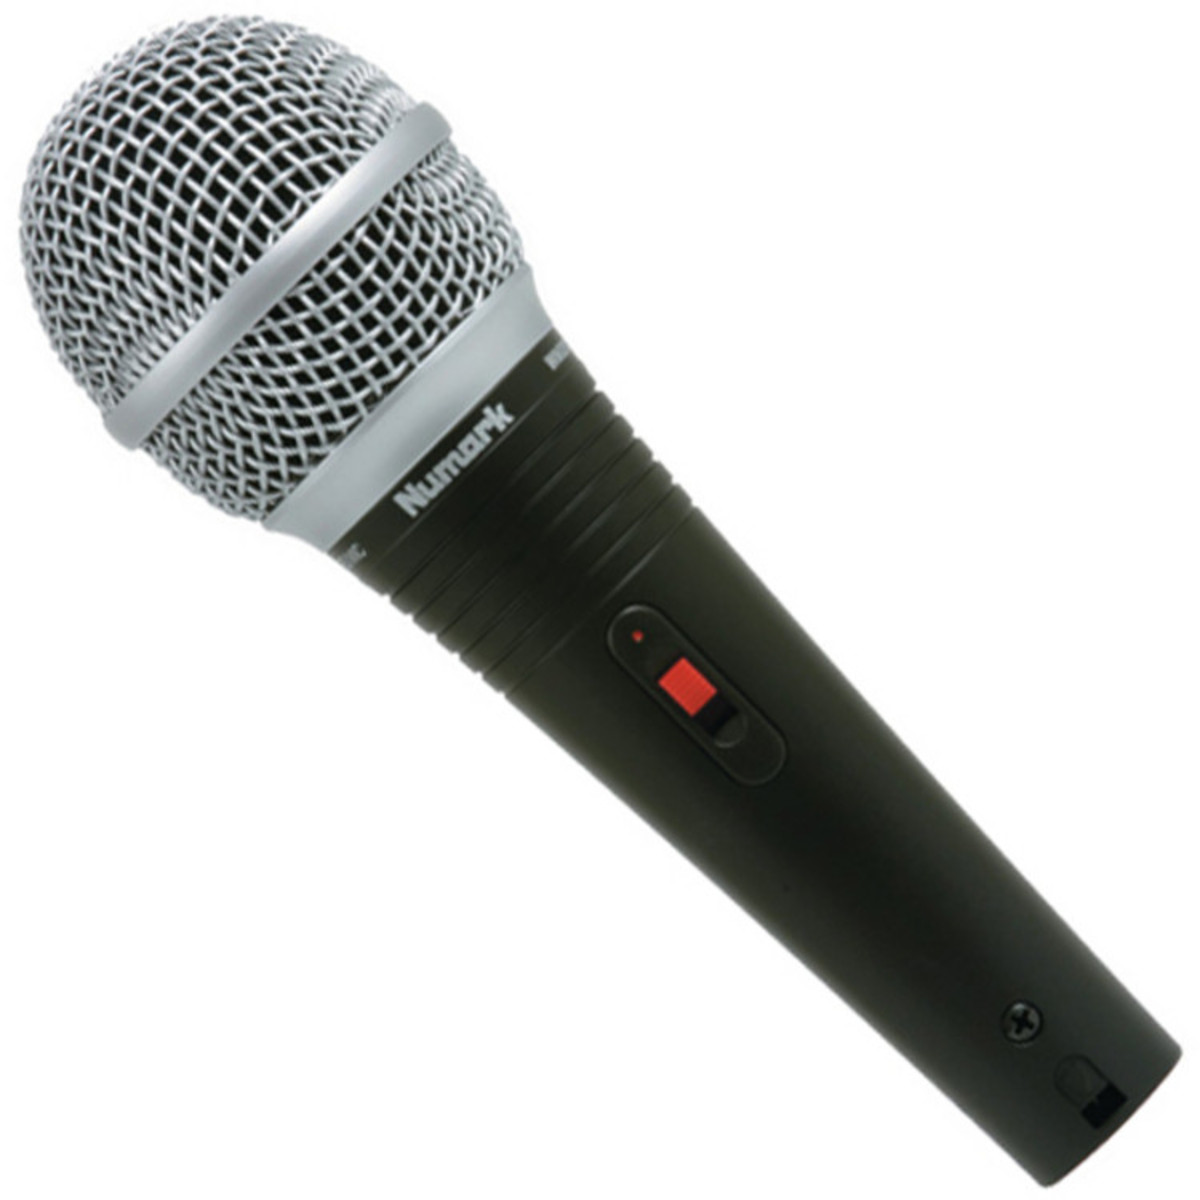 Image of Numark WM200 Handheld Dynamic DJ Microphone